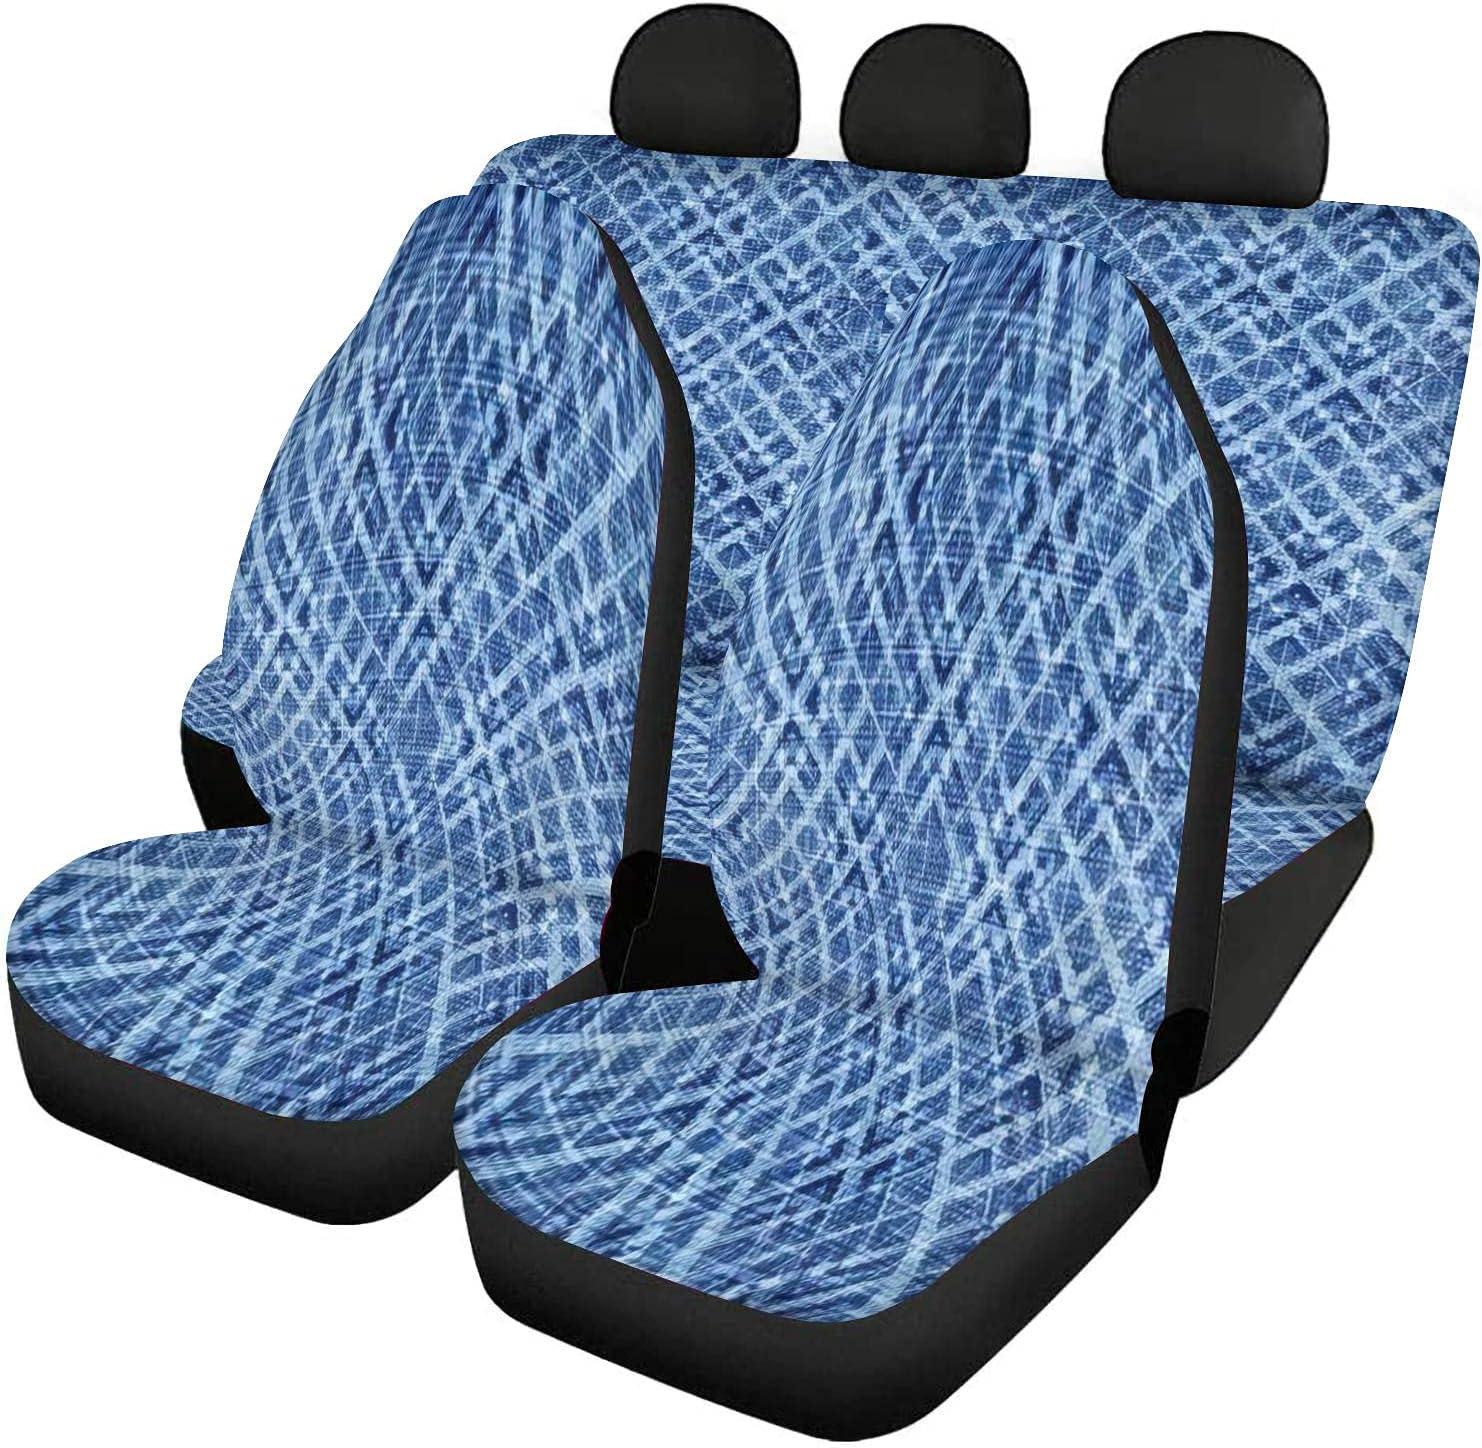 GDSJEGQM Classic Car Seat Covers Ranking TOP3 Full Set - Pattern Indigo Abst Seamless